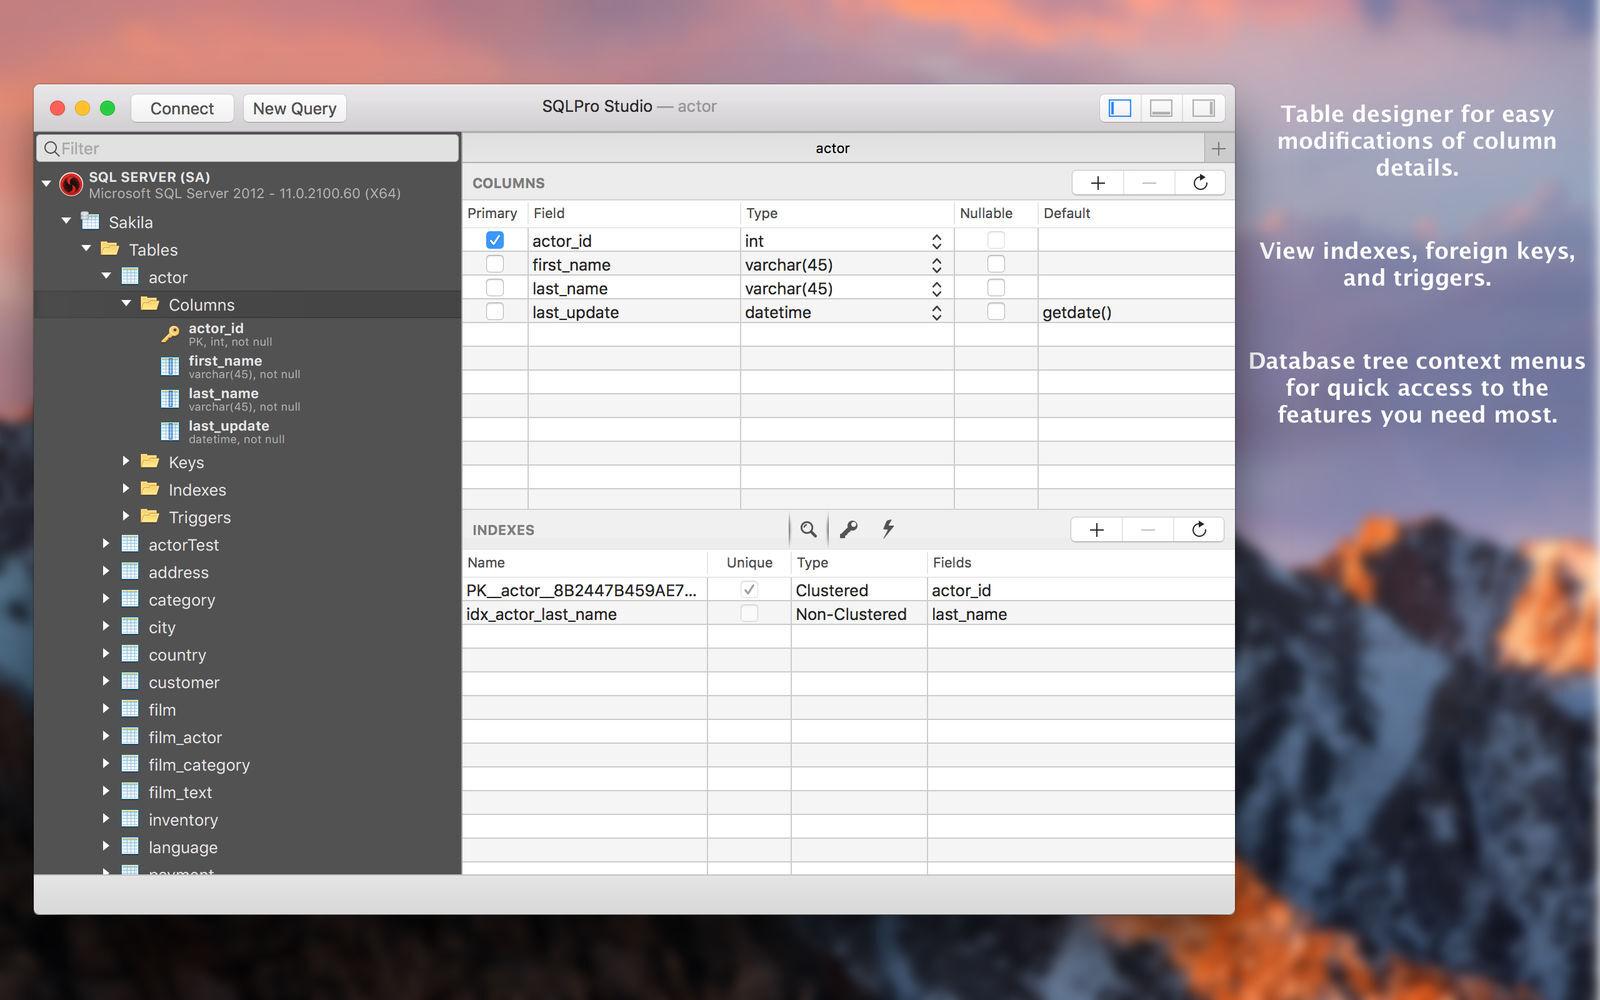 SQLPro Studio for Mac